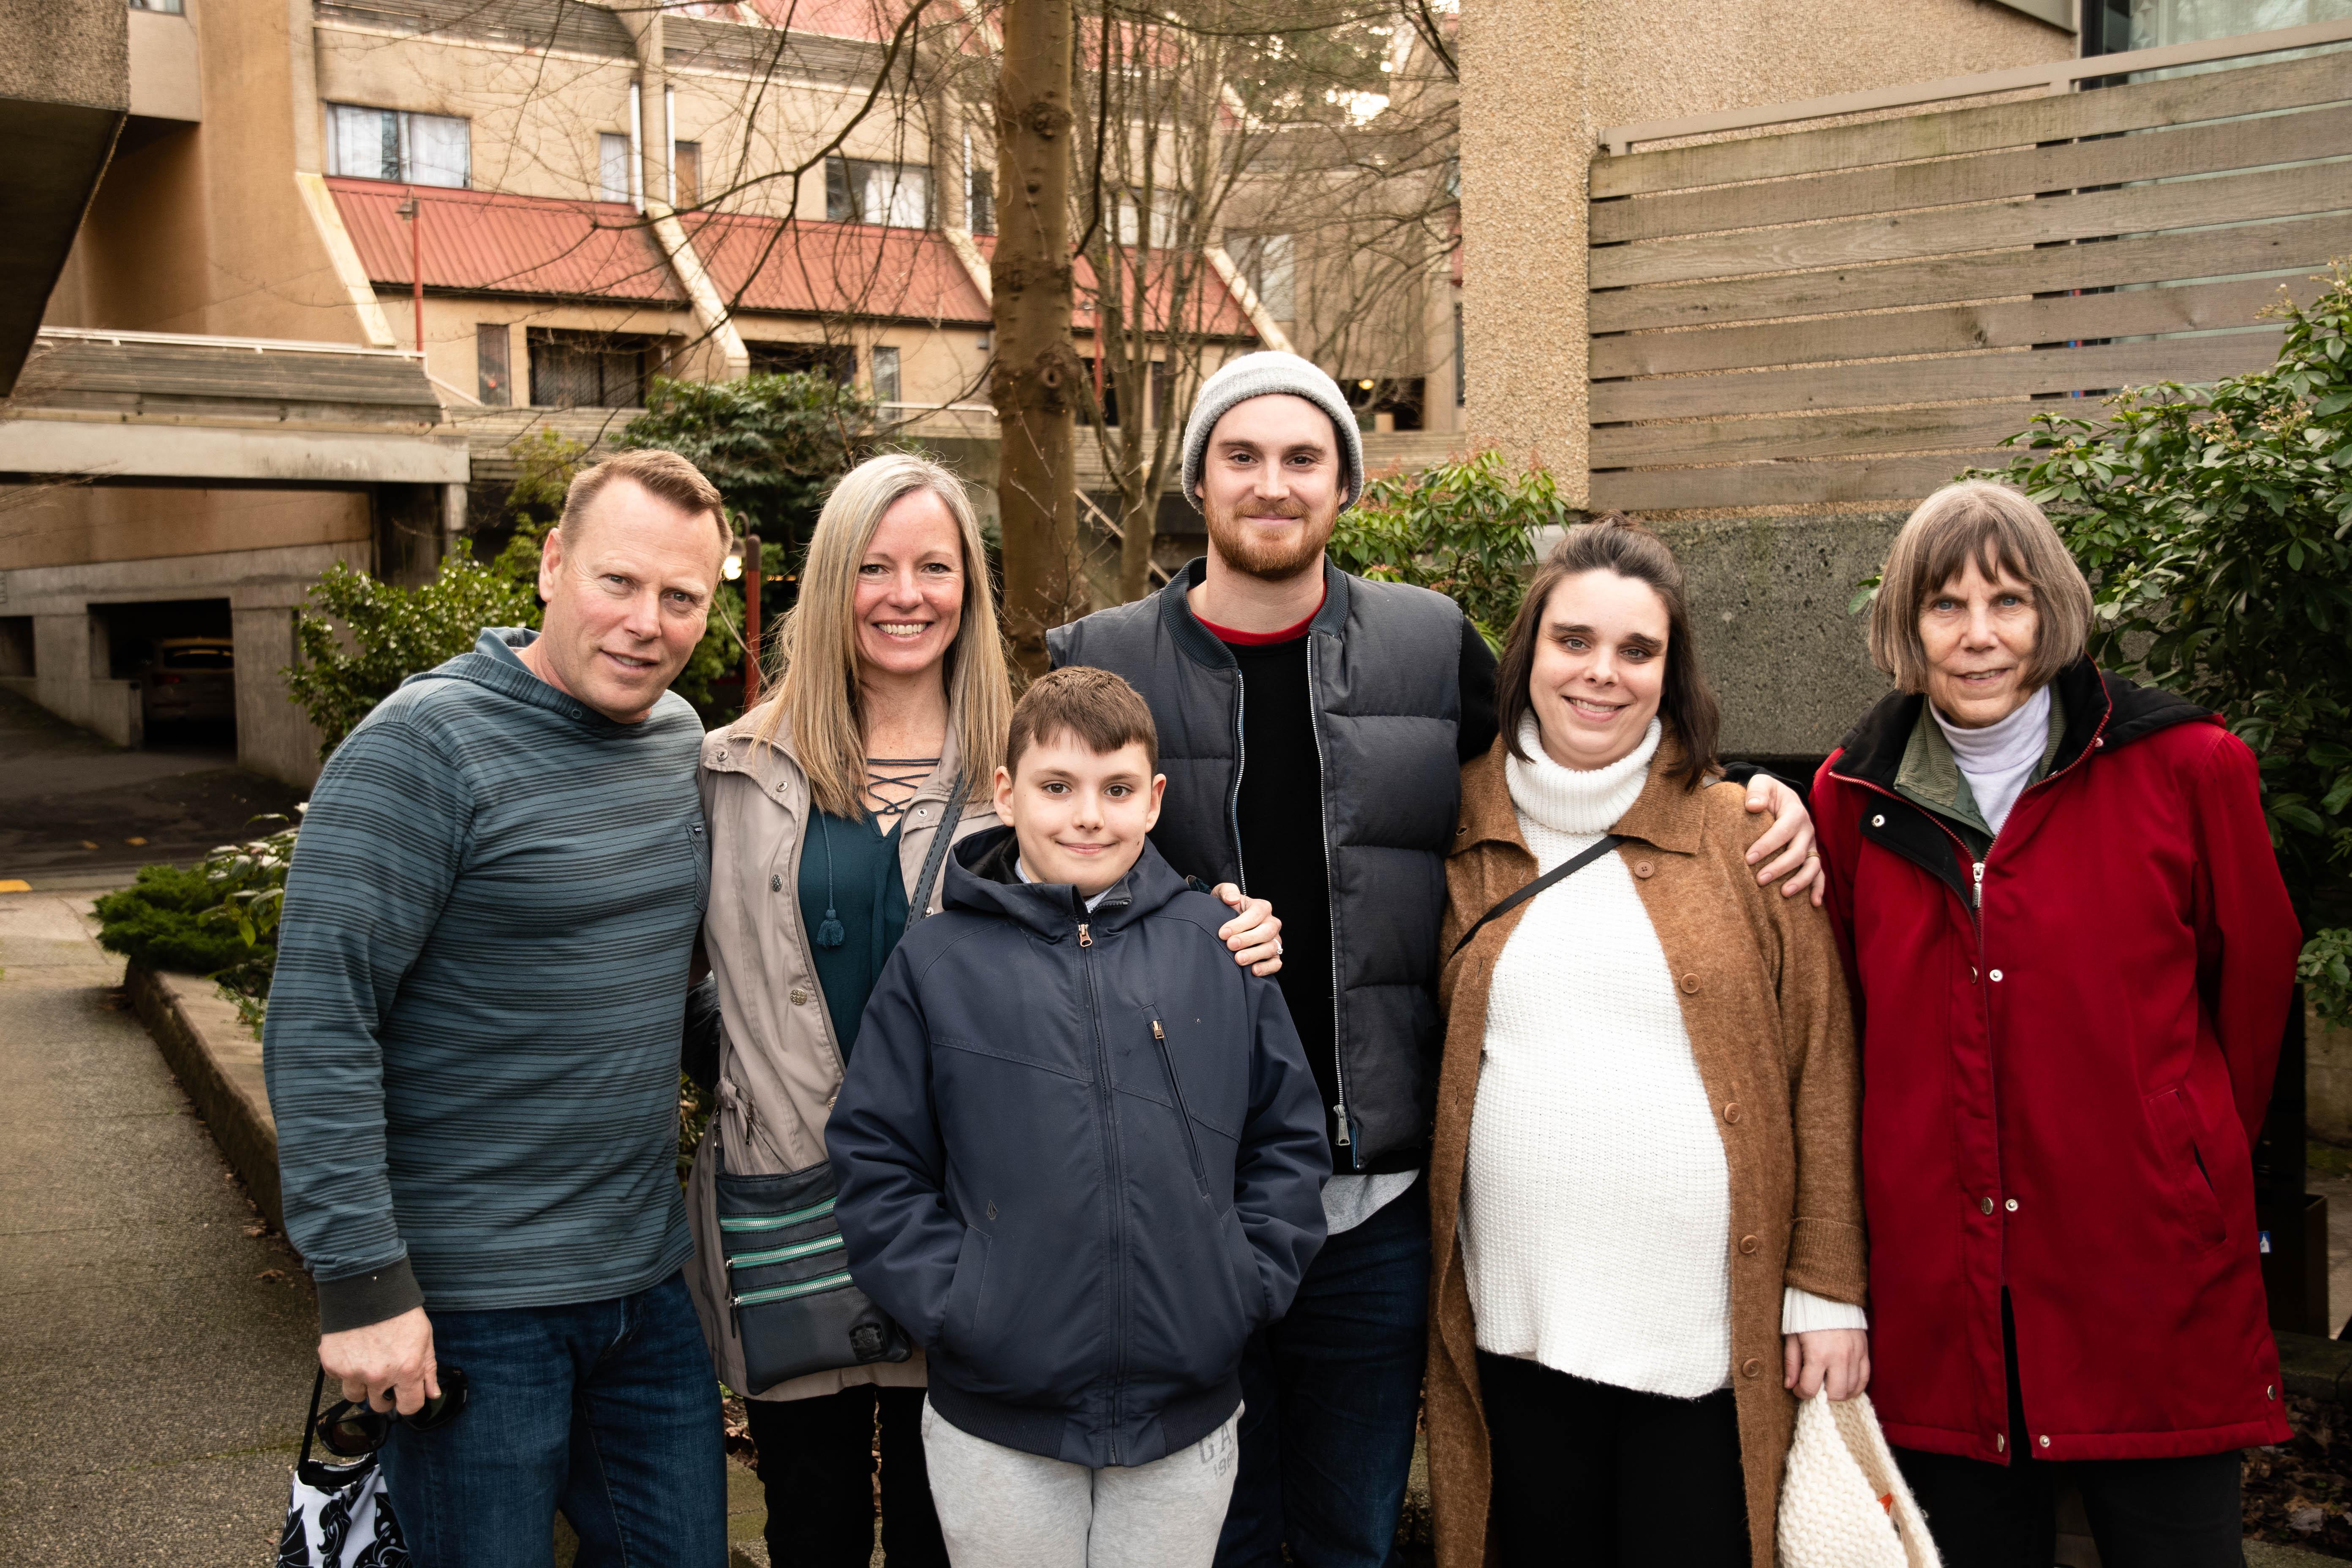 L to R: Mike, Christie, (their son) Jesse, Matt, Dani, Nancy